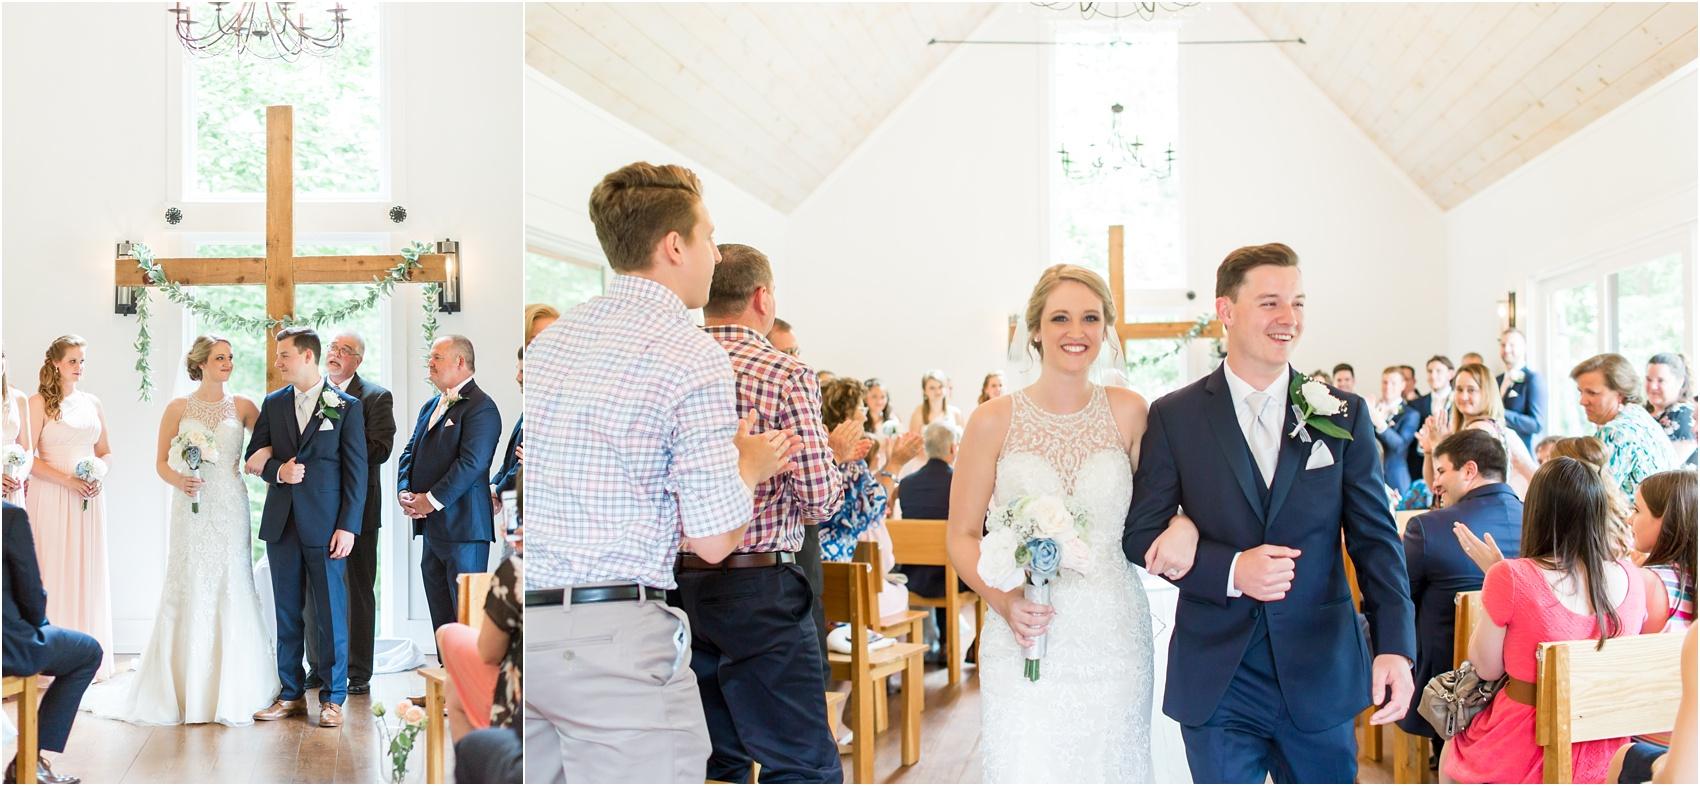 Savannah Eve Photography- Roper-Powell Wedding- Blog-35.jpg